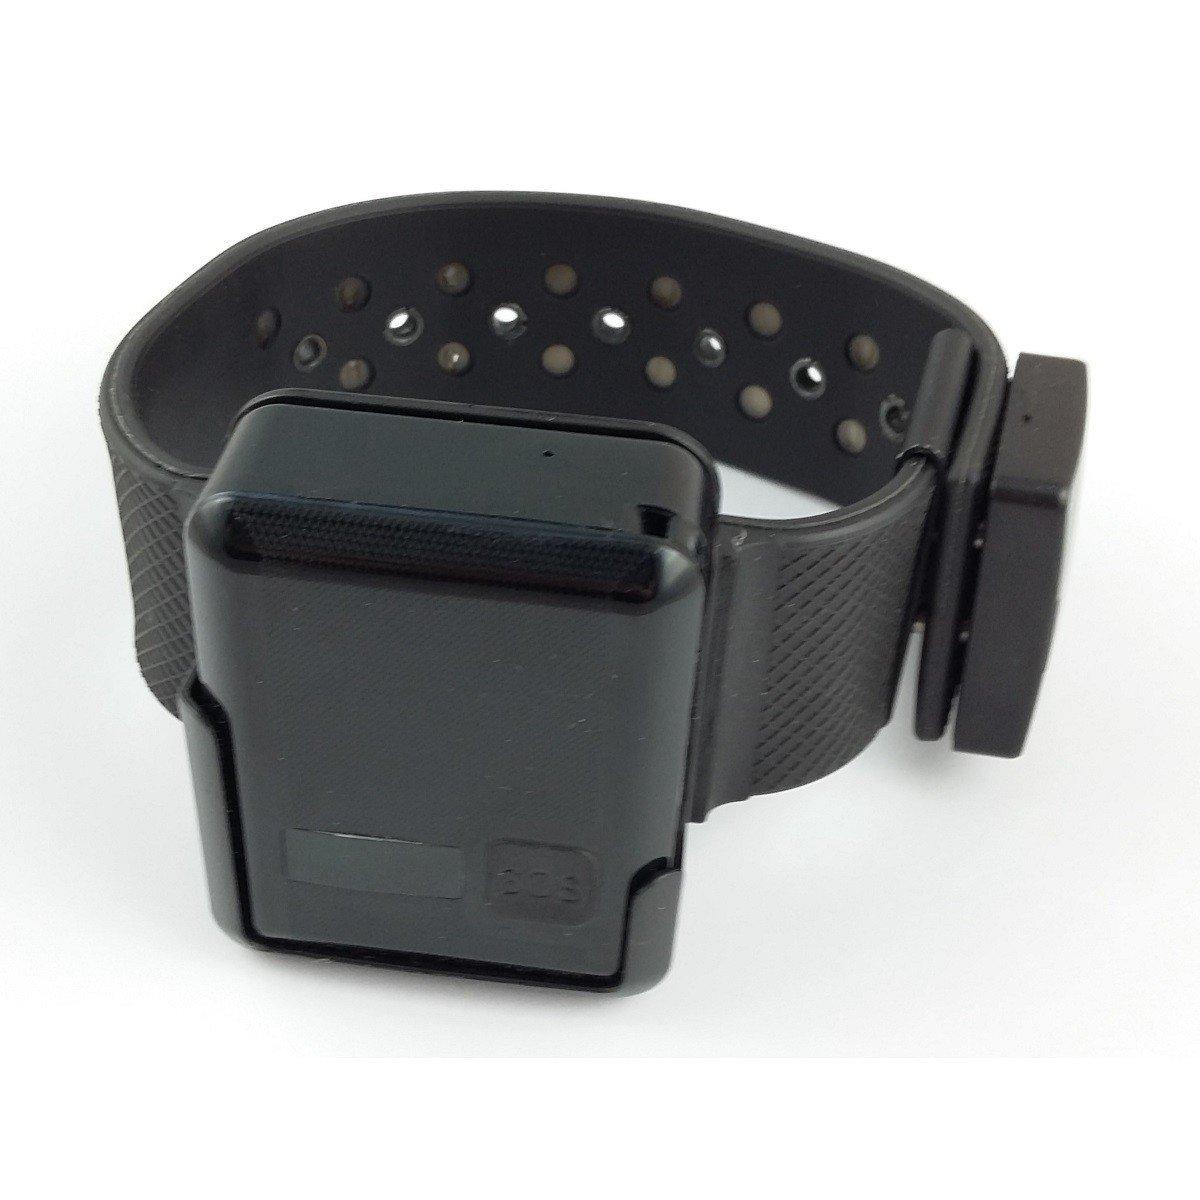 Elektronische Fußfessel DX-210 Hauptbild